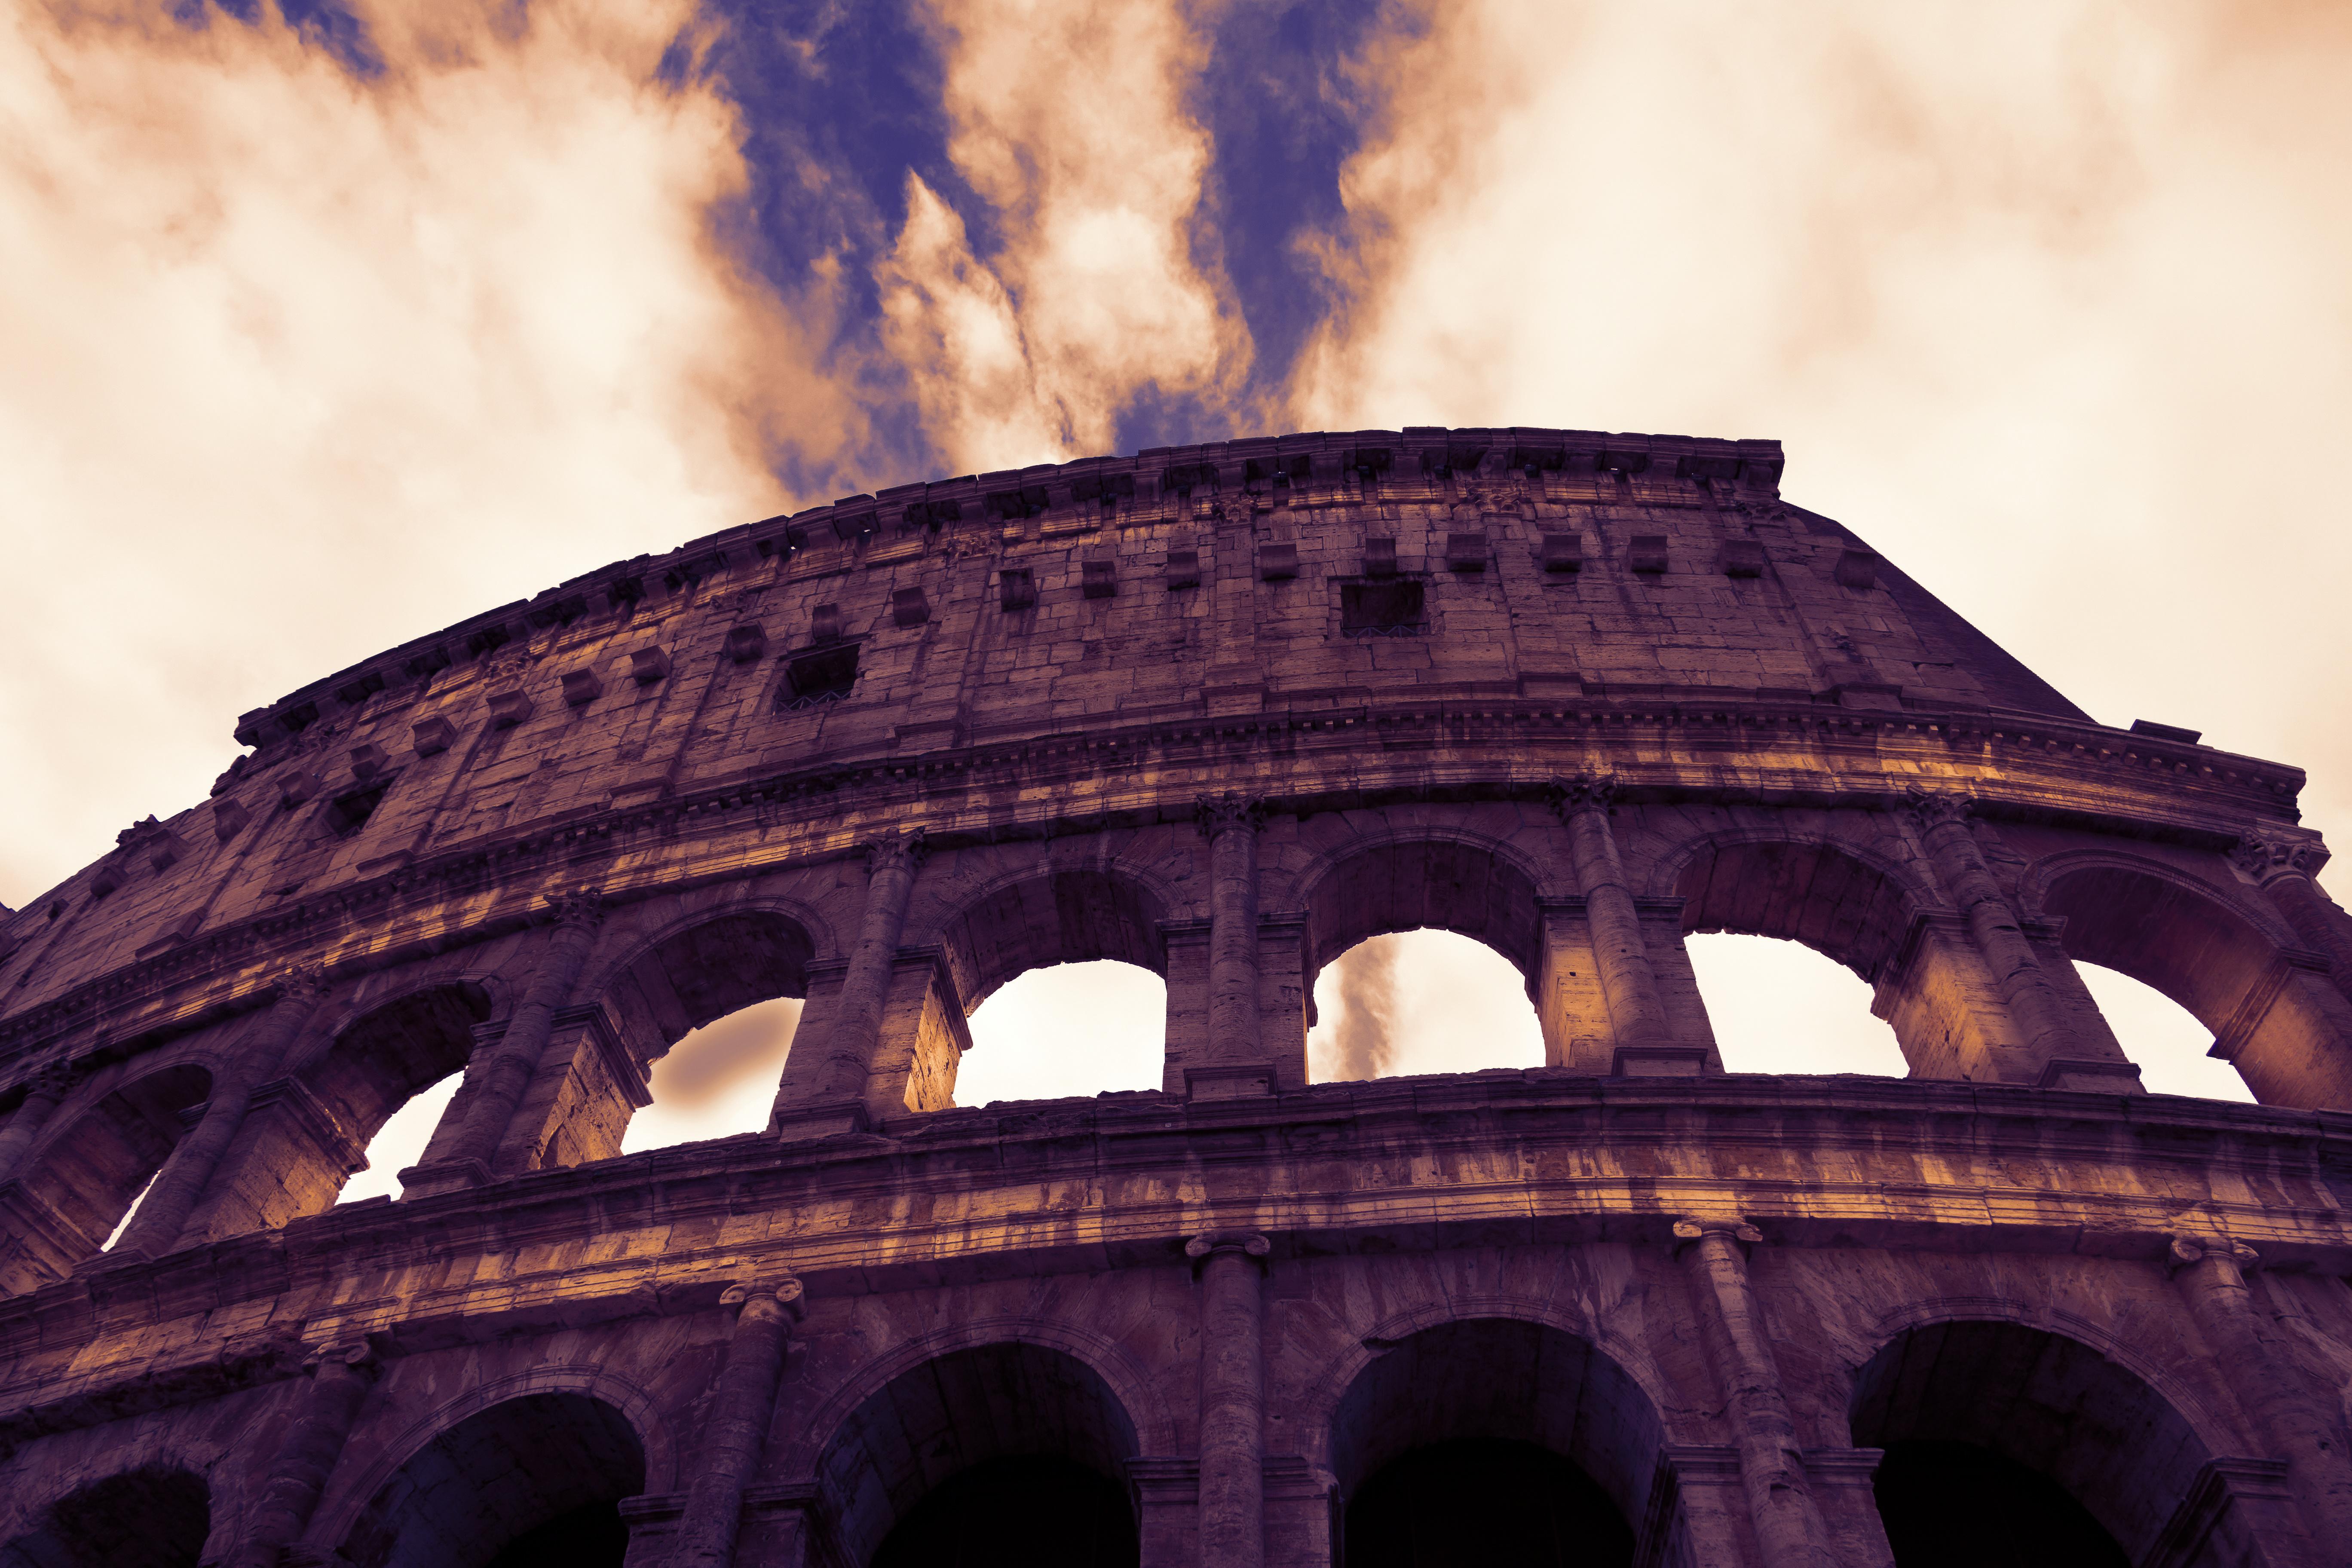 Roman Colloseum in Rome, Italy - low angle